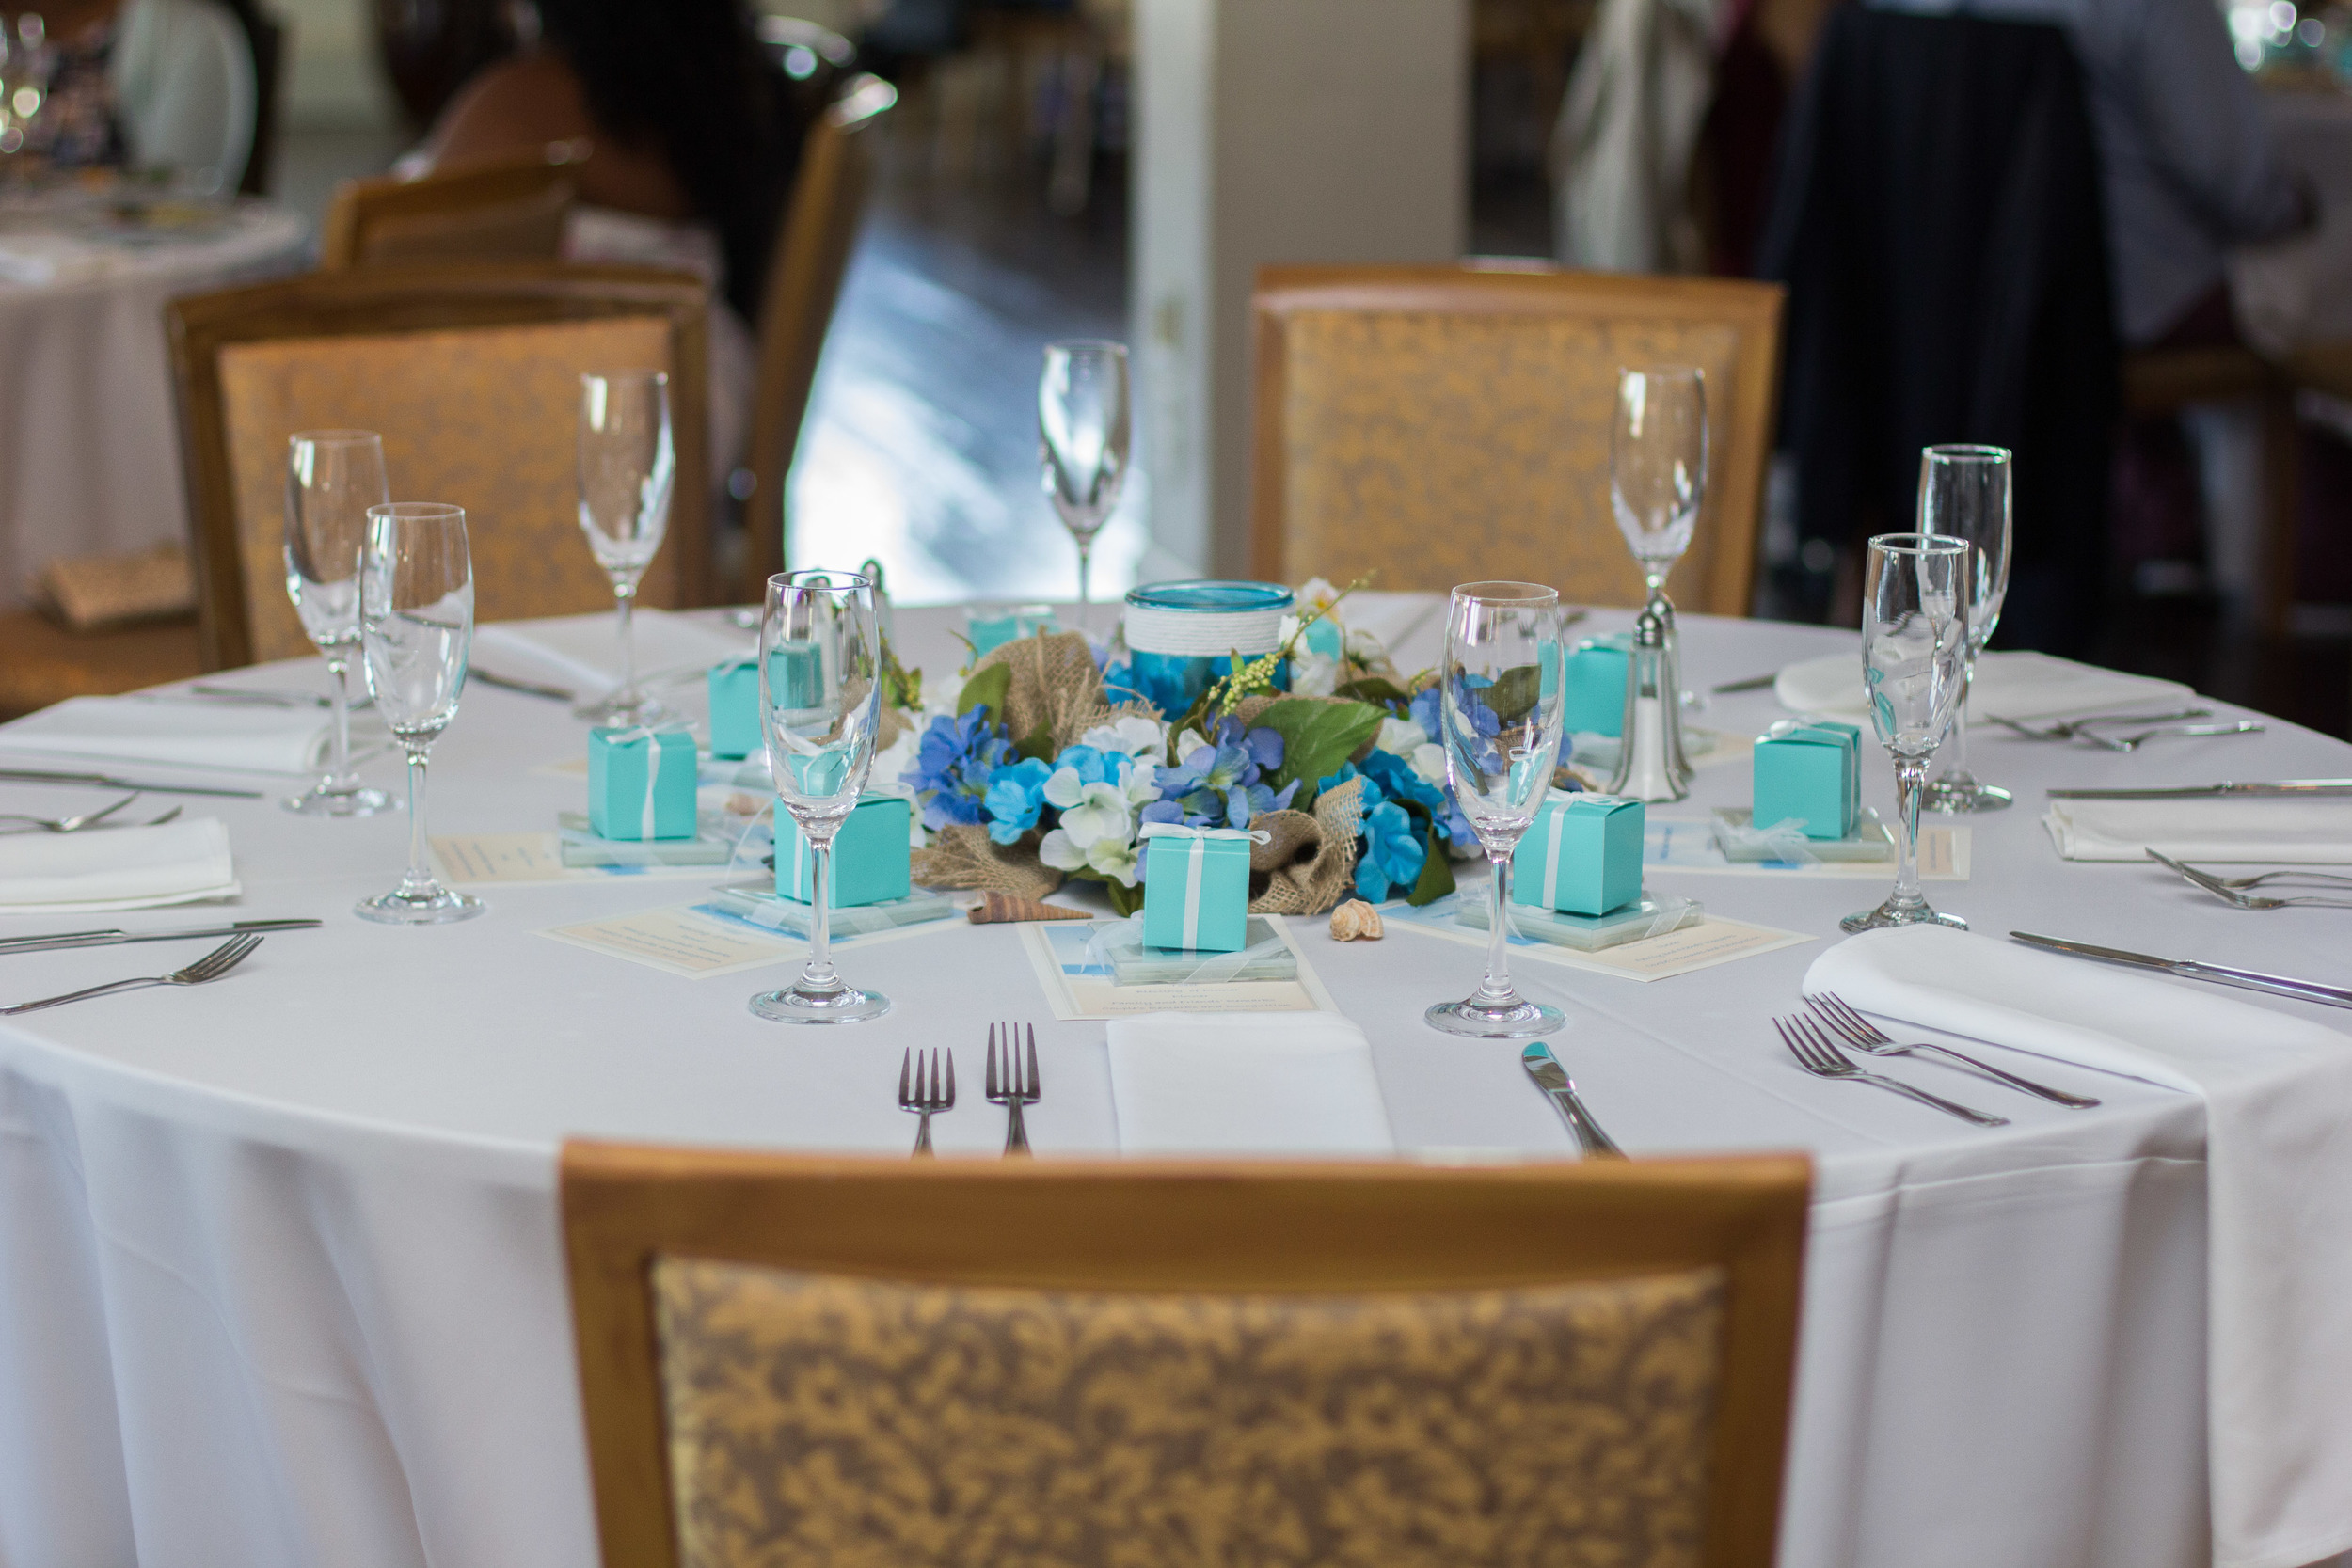 Martinsborough Wedding Reception - Greenville NC : Natalie + Mark | Bryant Tyson Photography